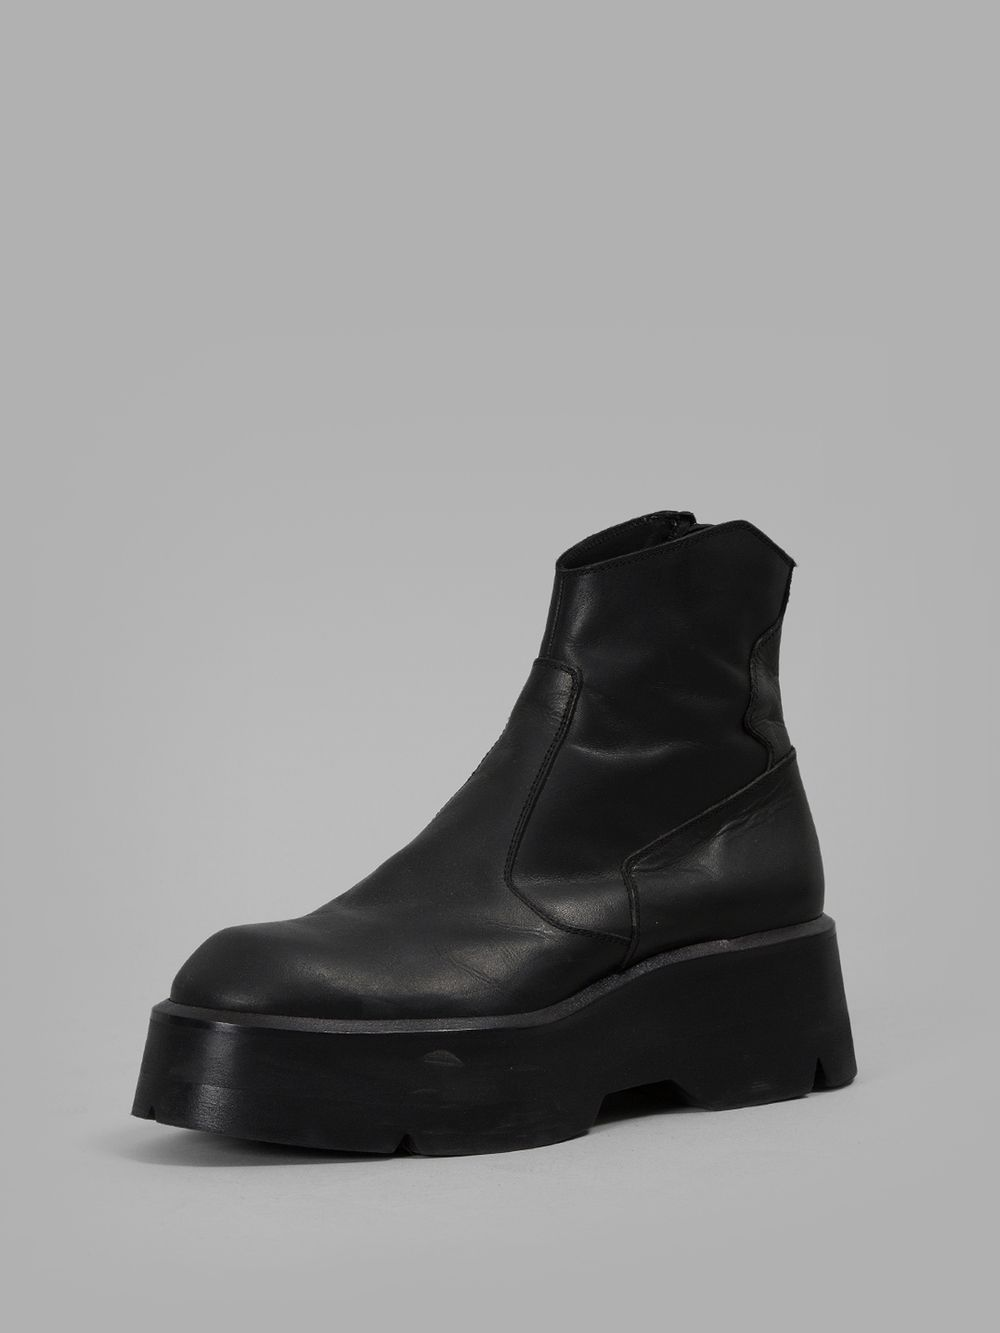 Julius - Men's black platform boots